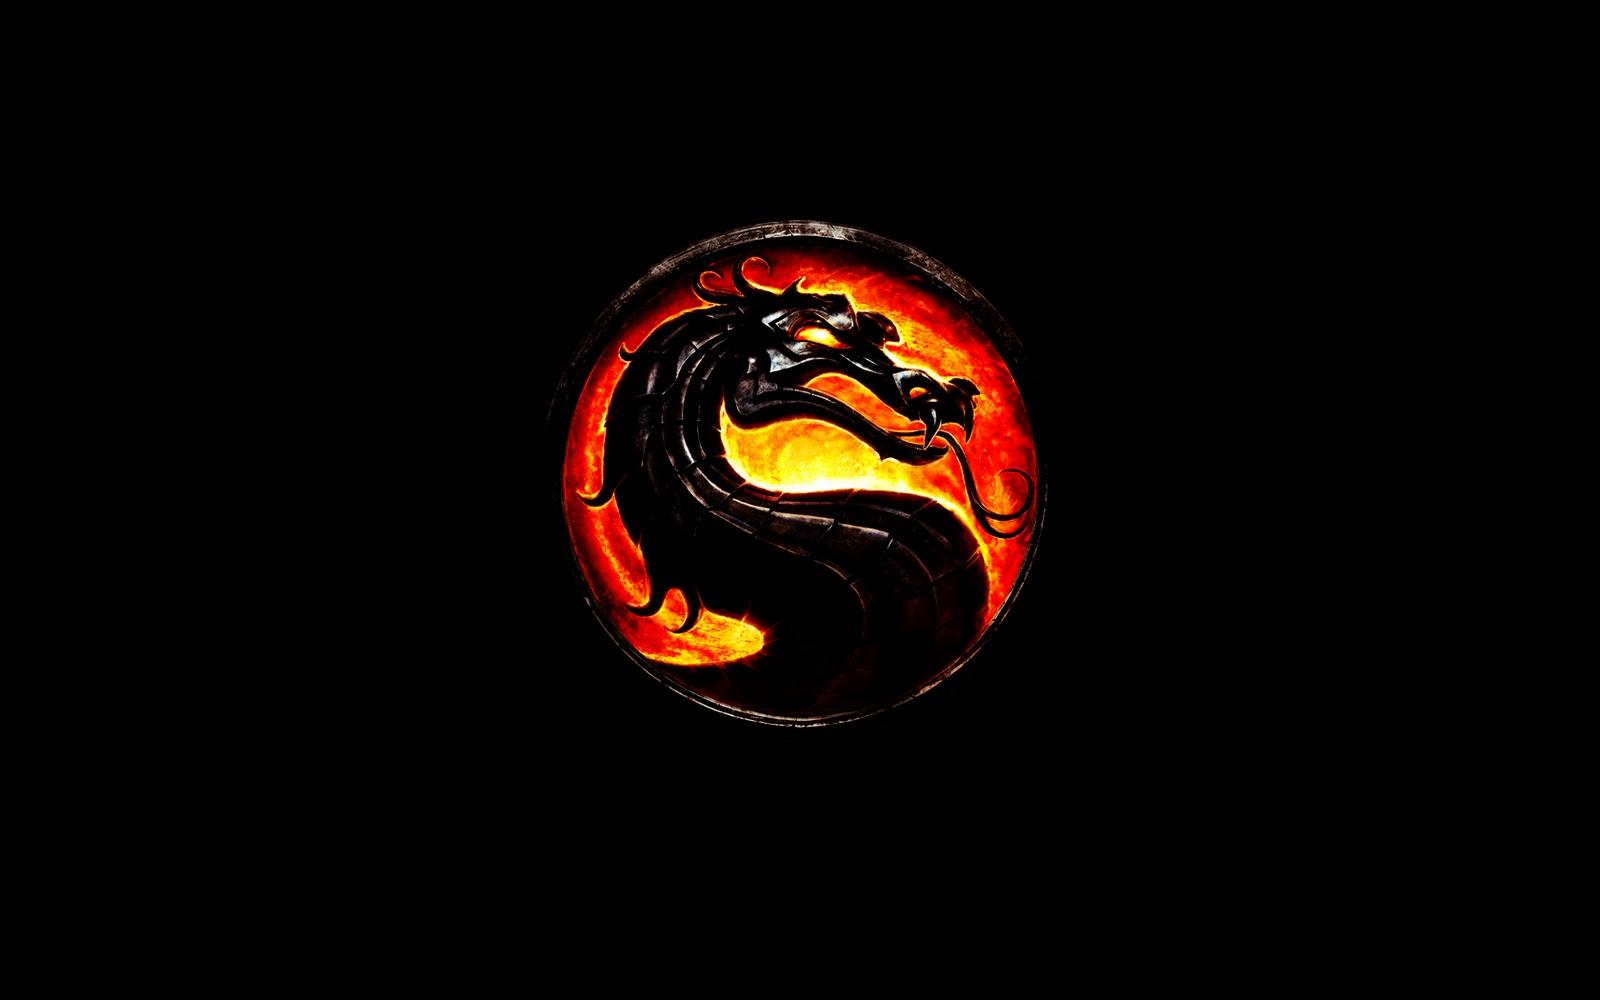 Dragon Logo Designs HD Wallpapers| HD Wallpapers ...